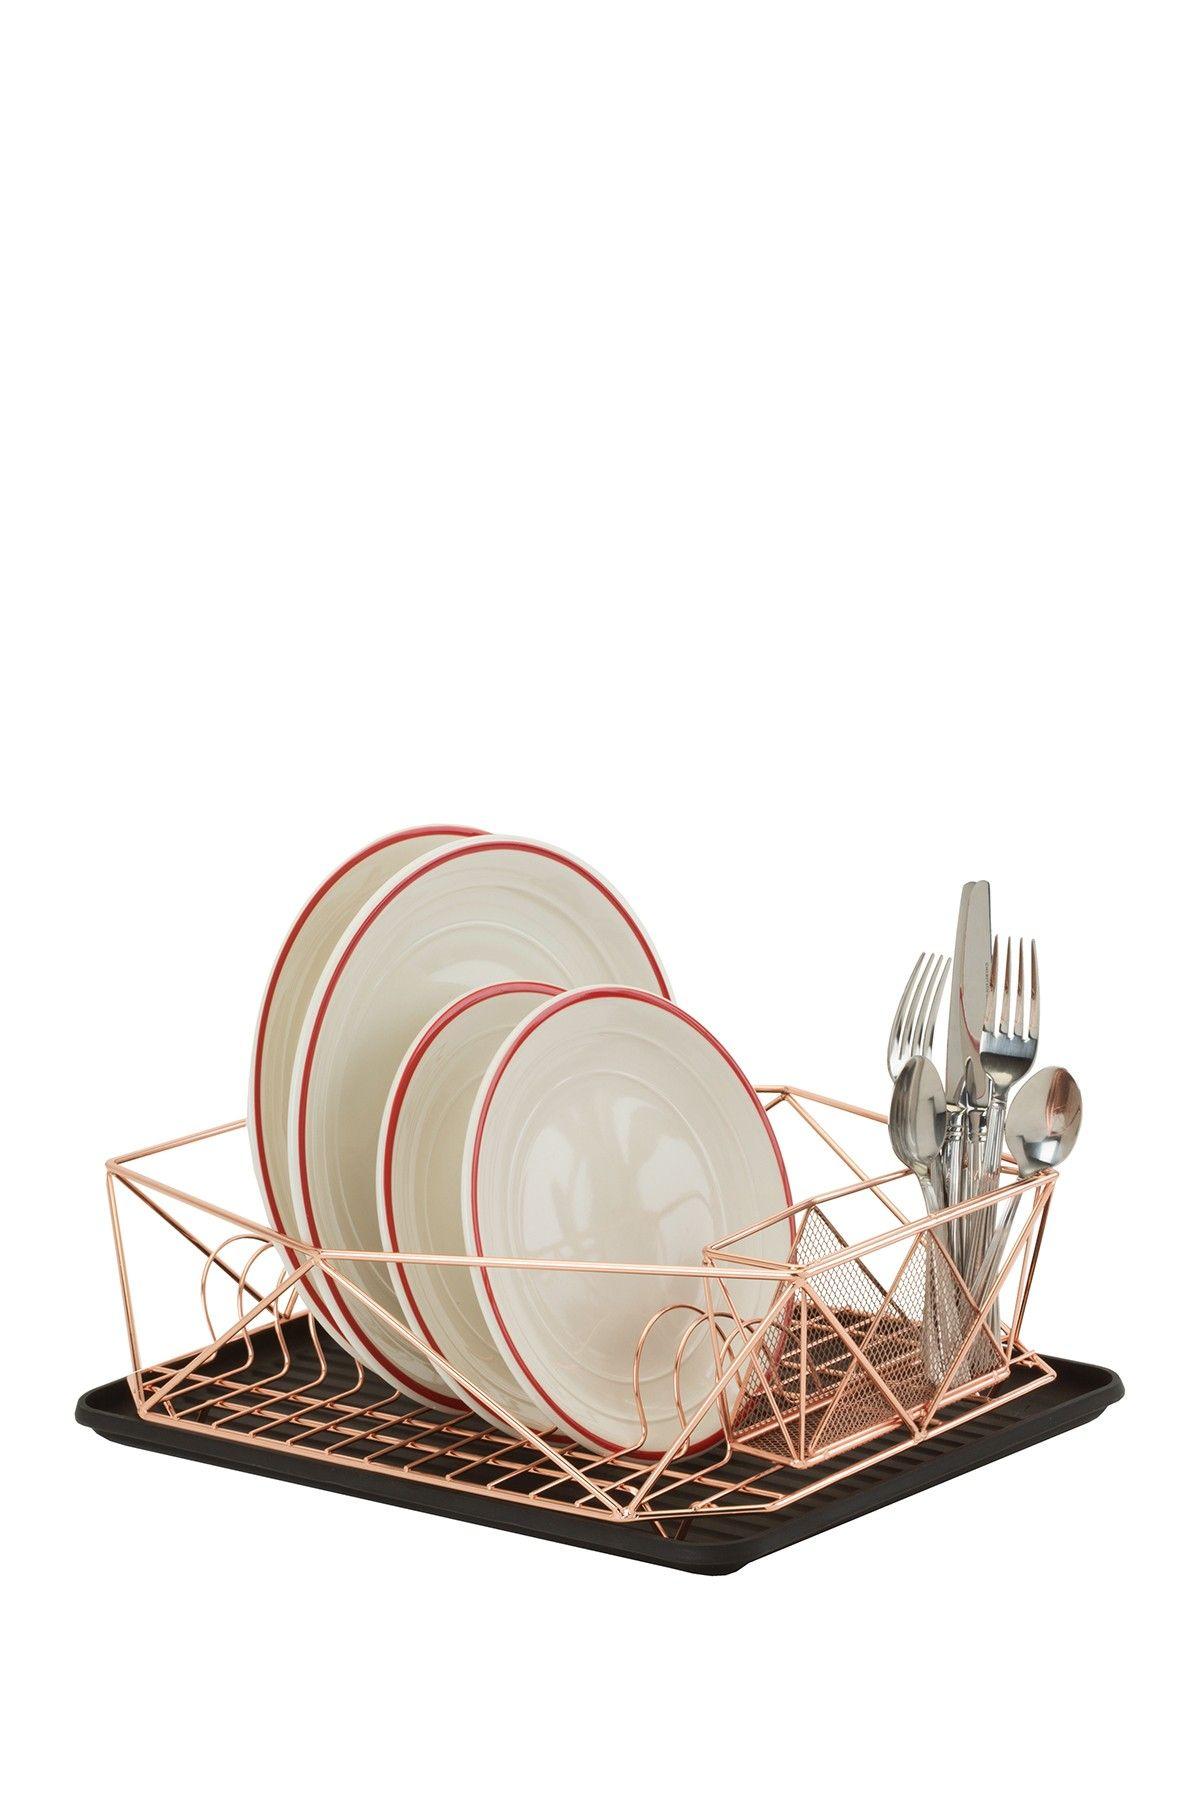 Kennedy International Inc. | Kitchen Details Geode Dish Rack - Copper | Nordstrom Rack